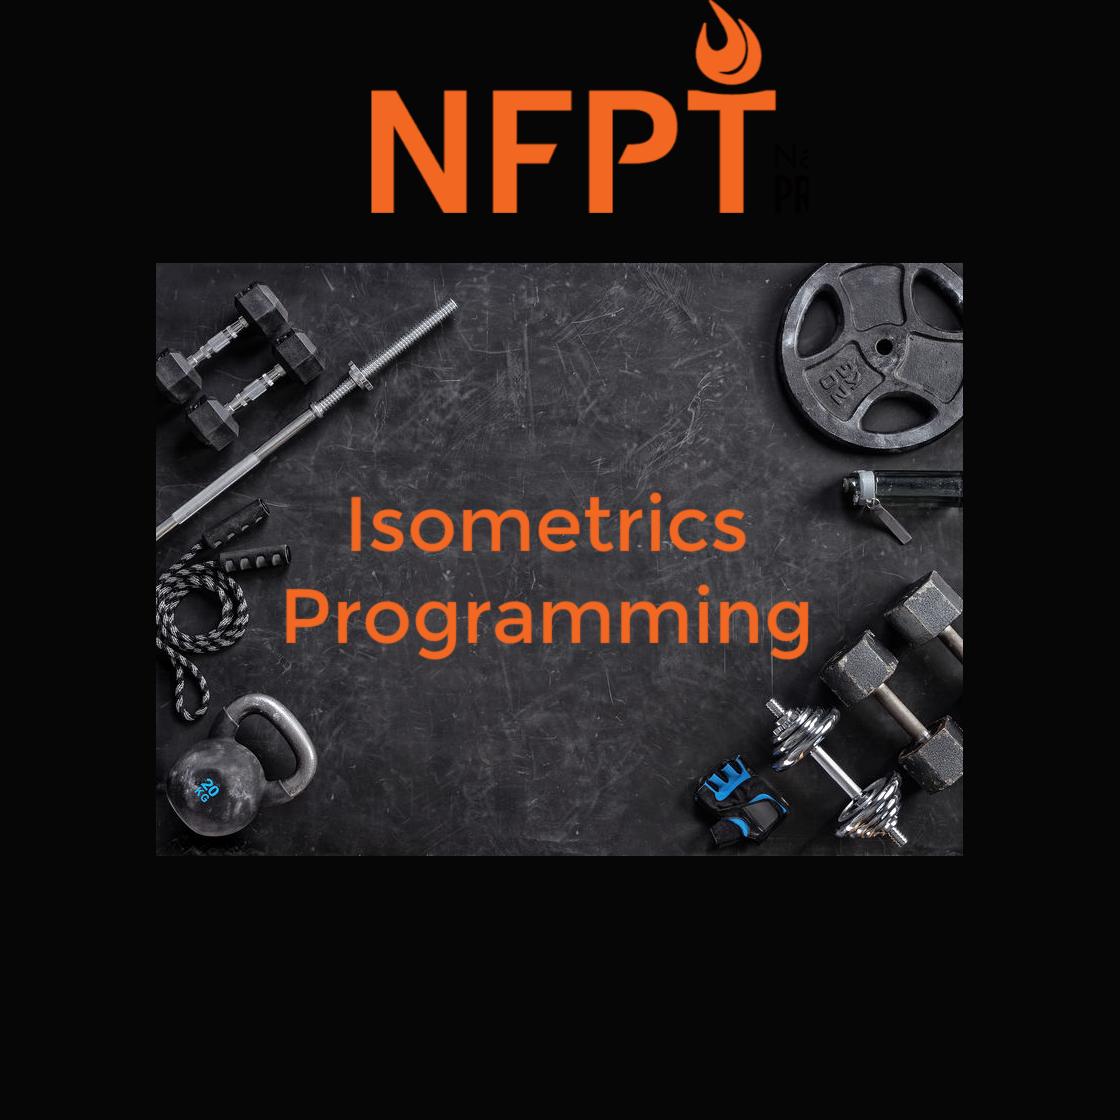 Isometrics Programming